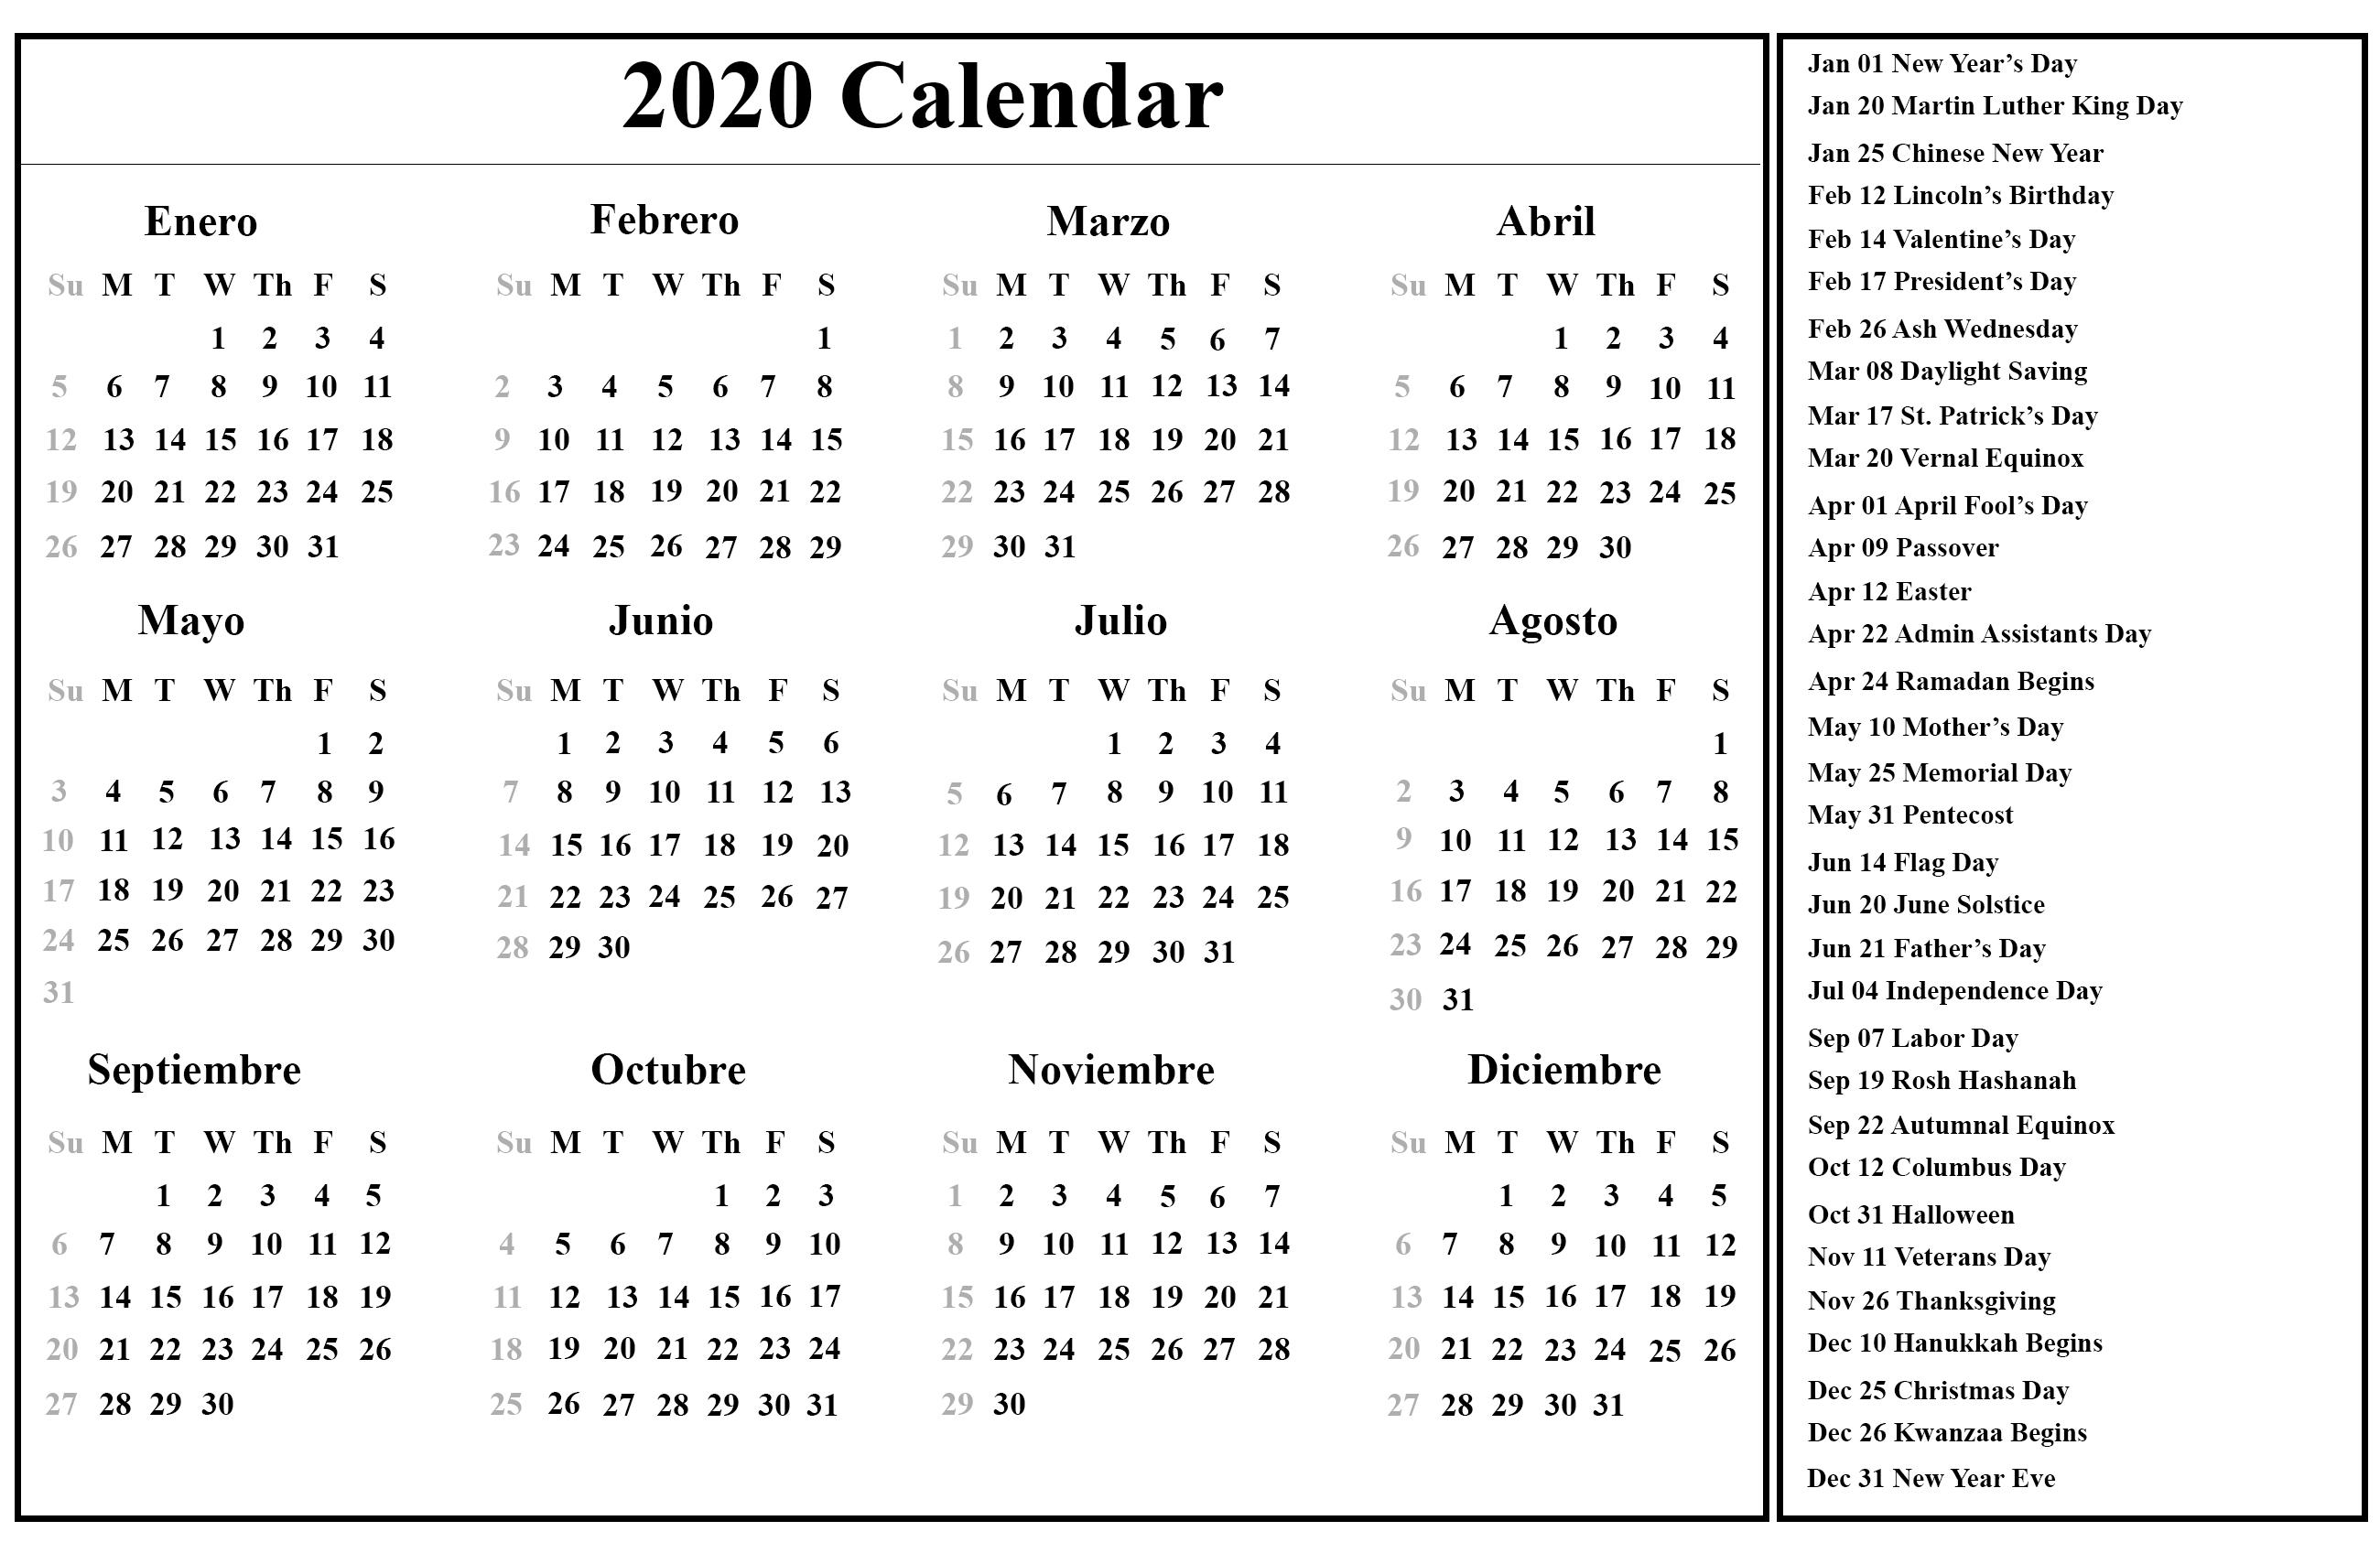 Free Printable Spanish Calendar 2020 | 2020 Calendario 2020 Calendar Holidays Sri Lanka